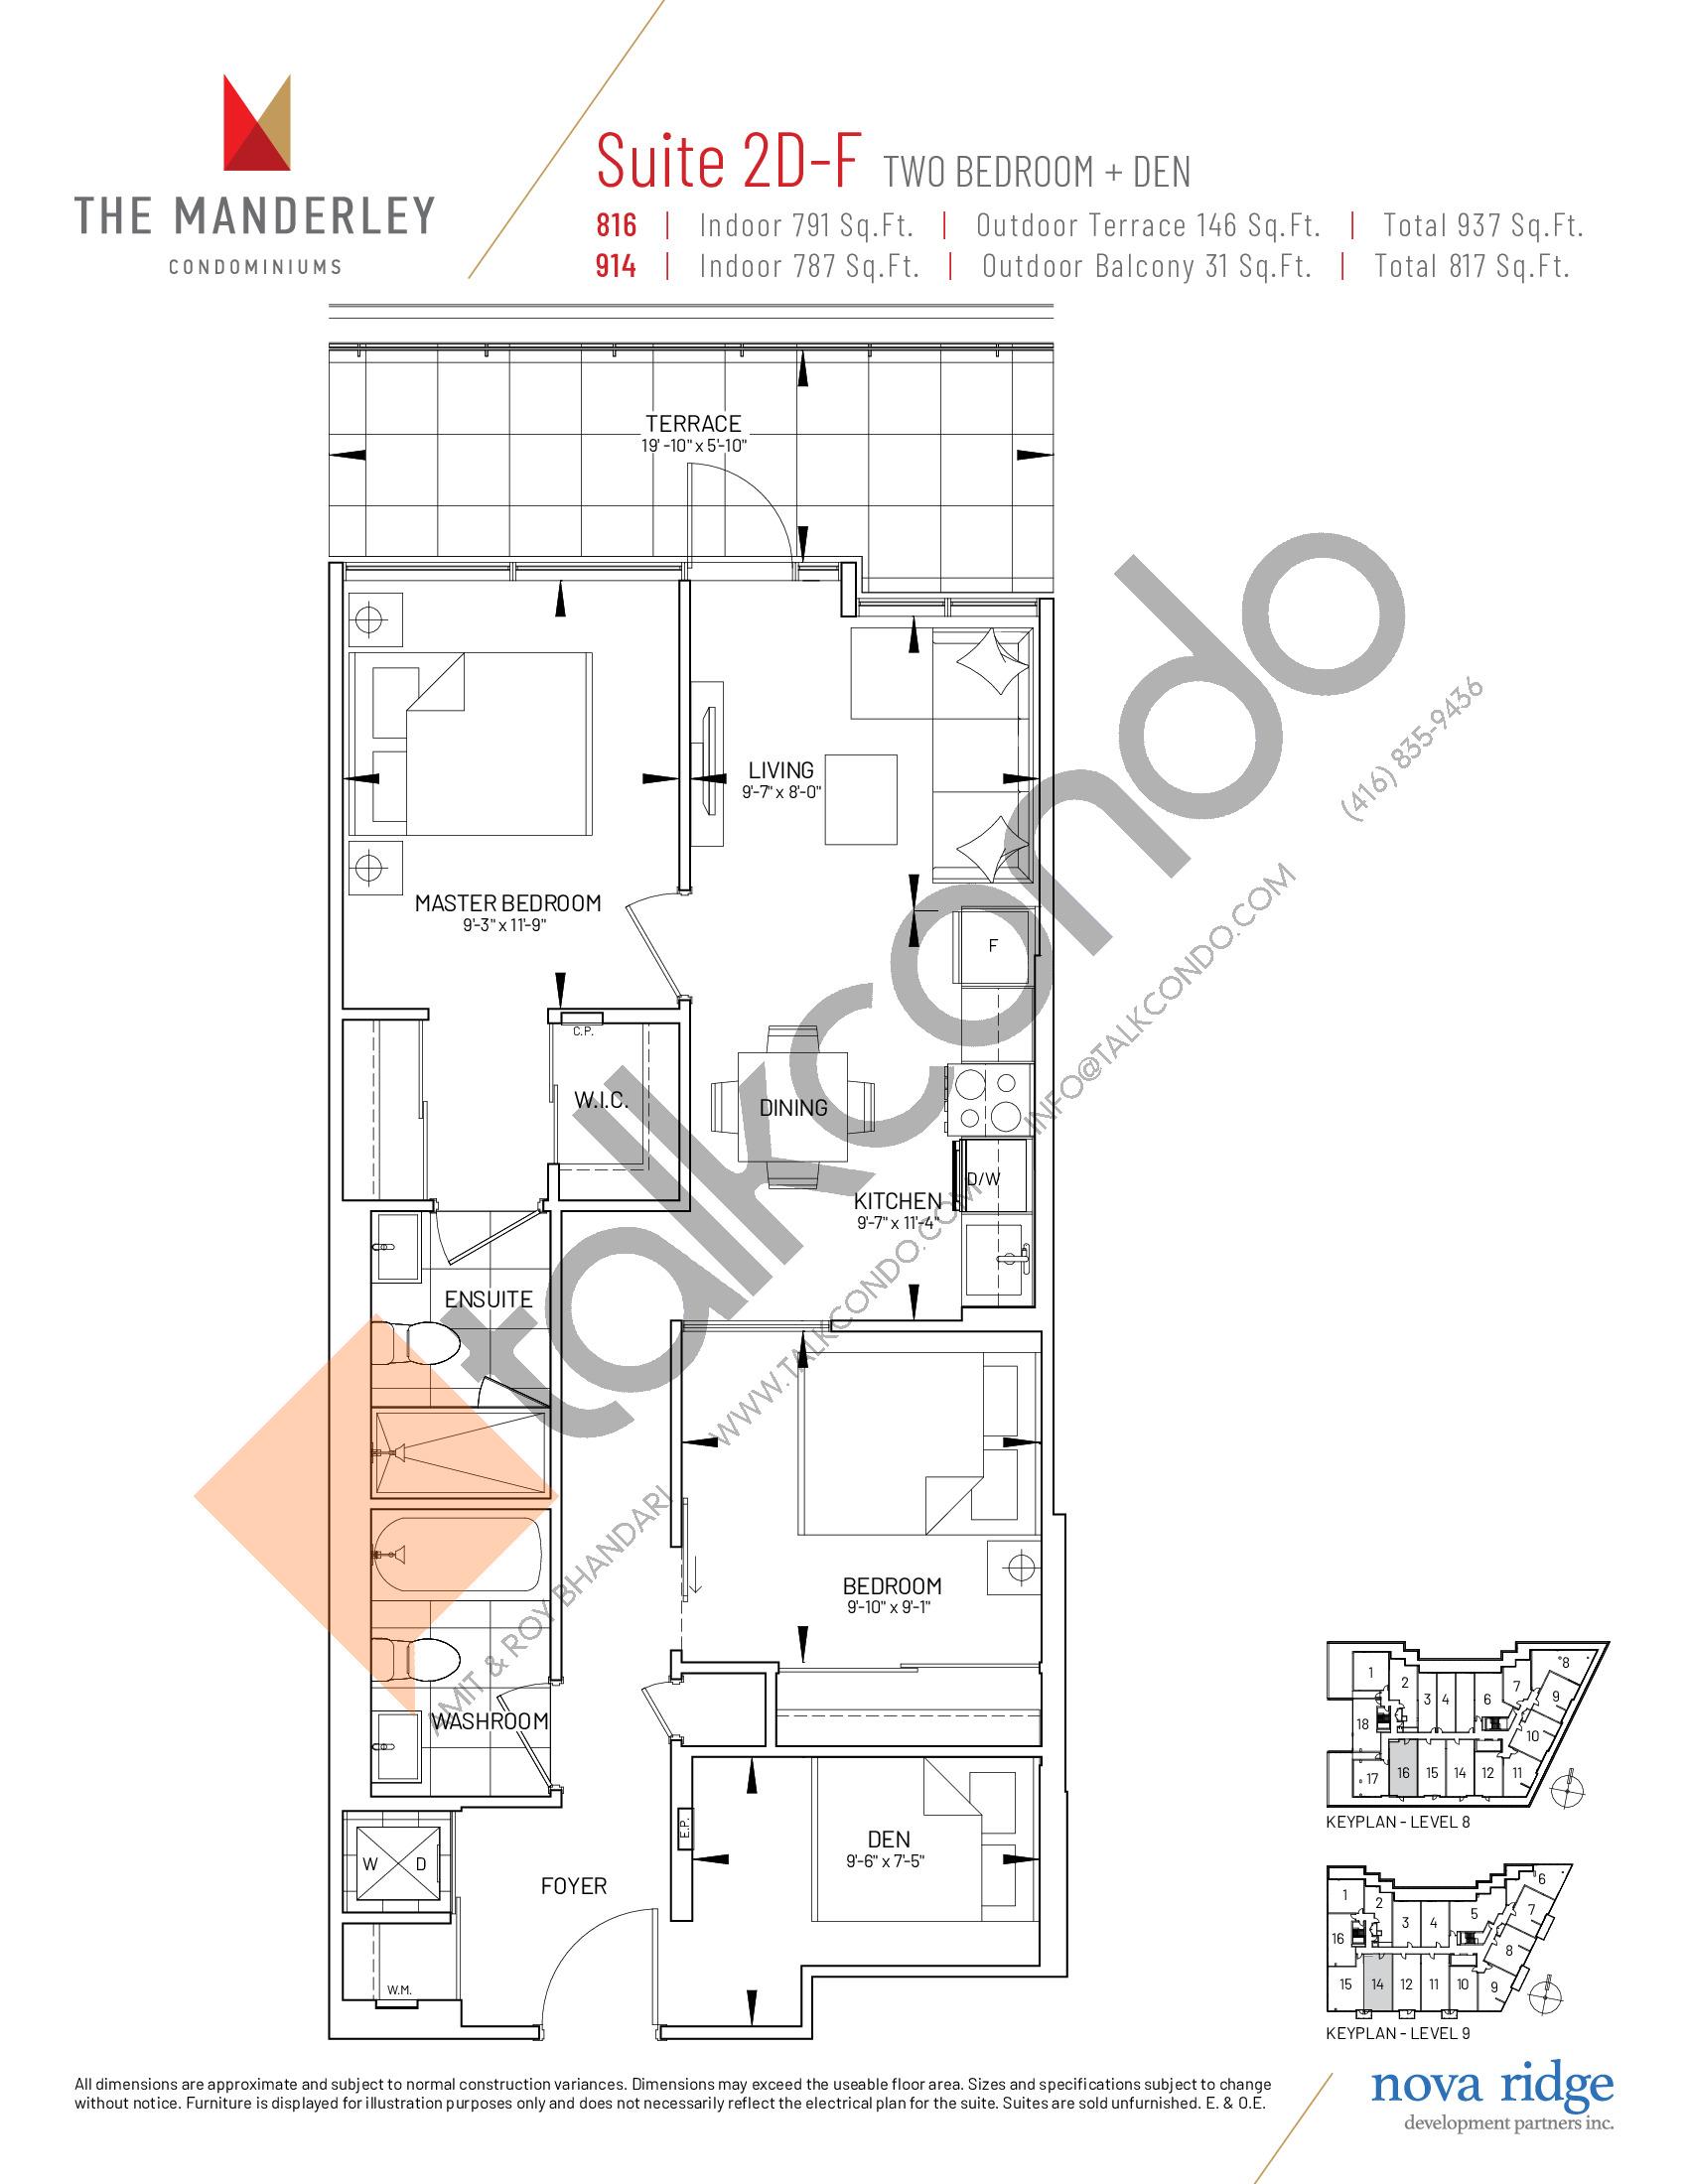 Suite 2D-F Floor Plan at The Manderley Condos - 791 sq.ft